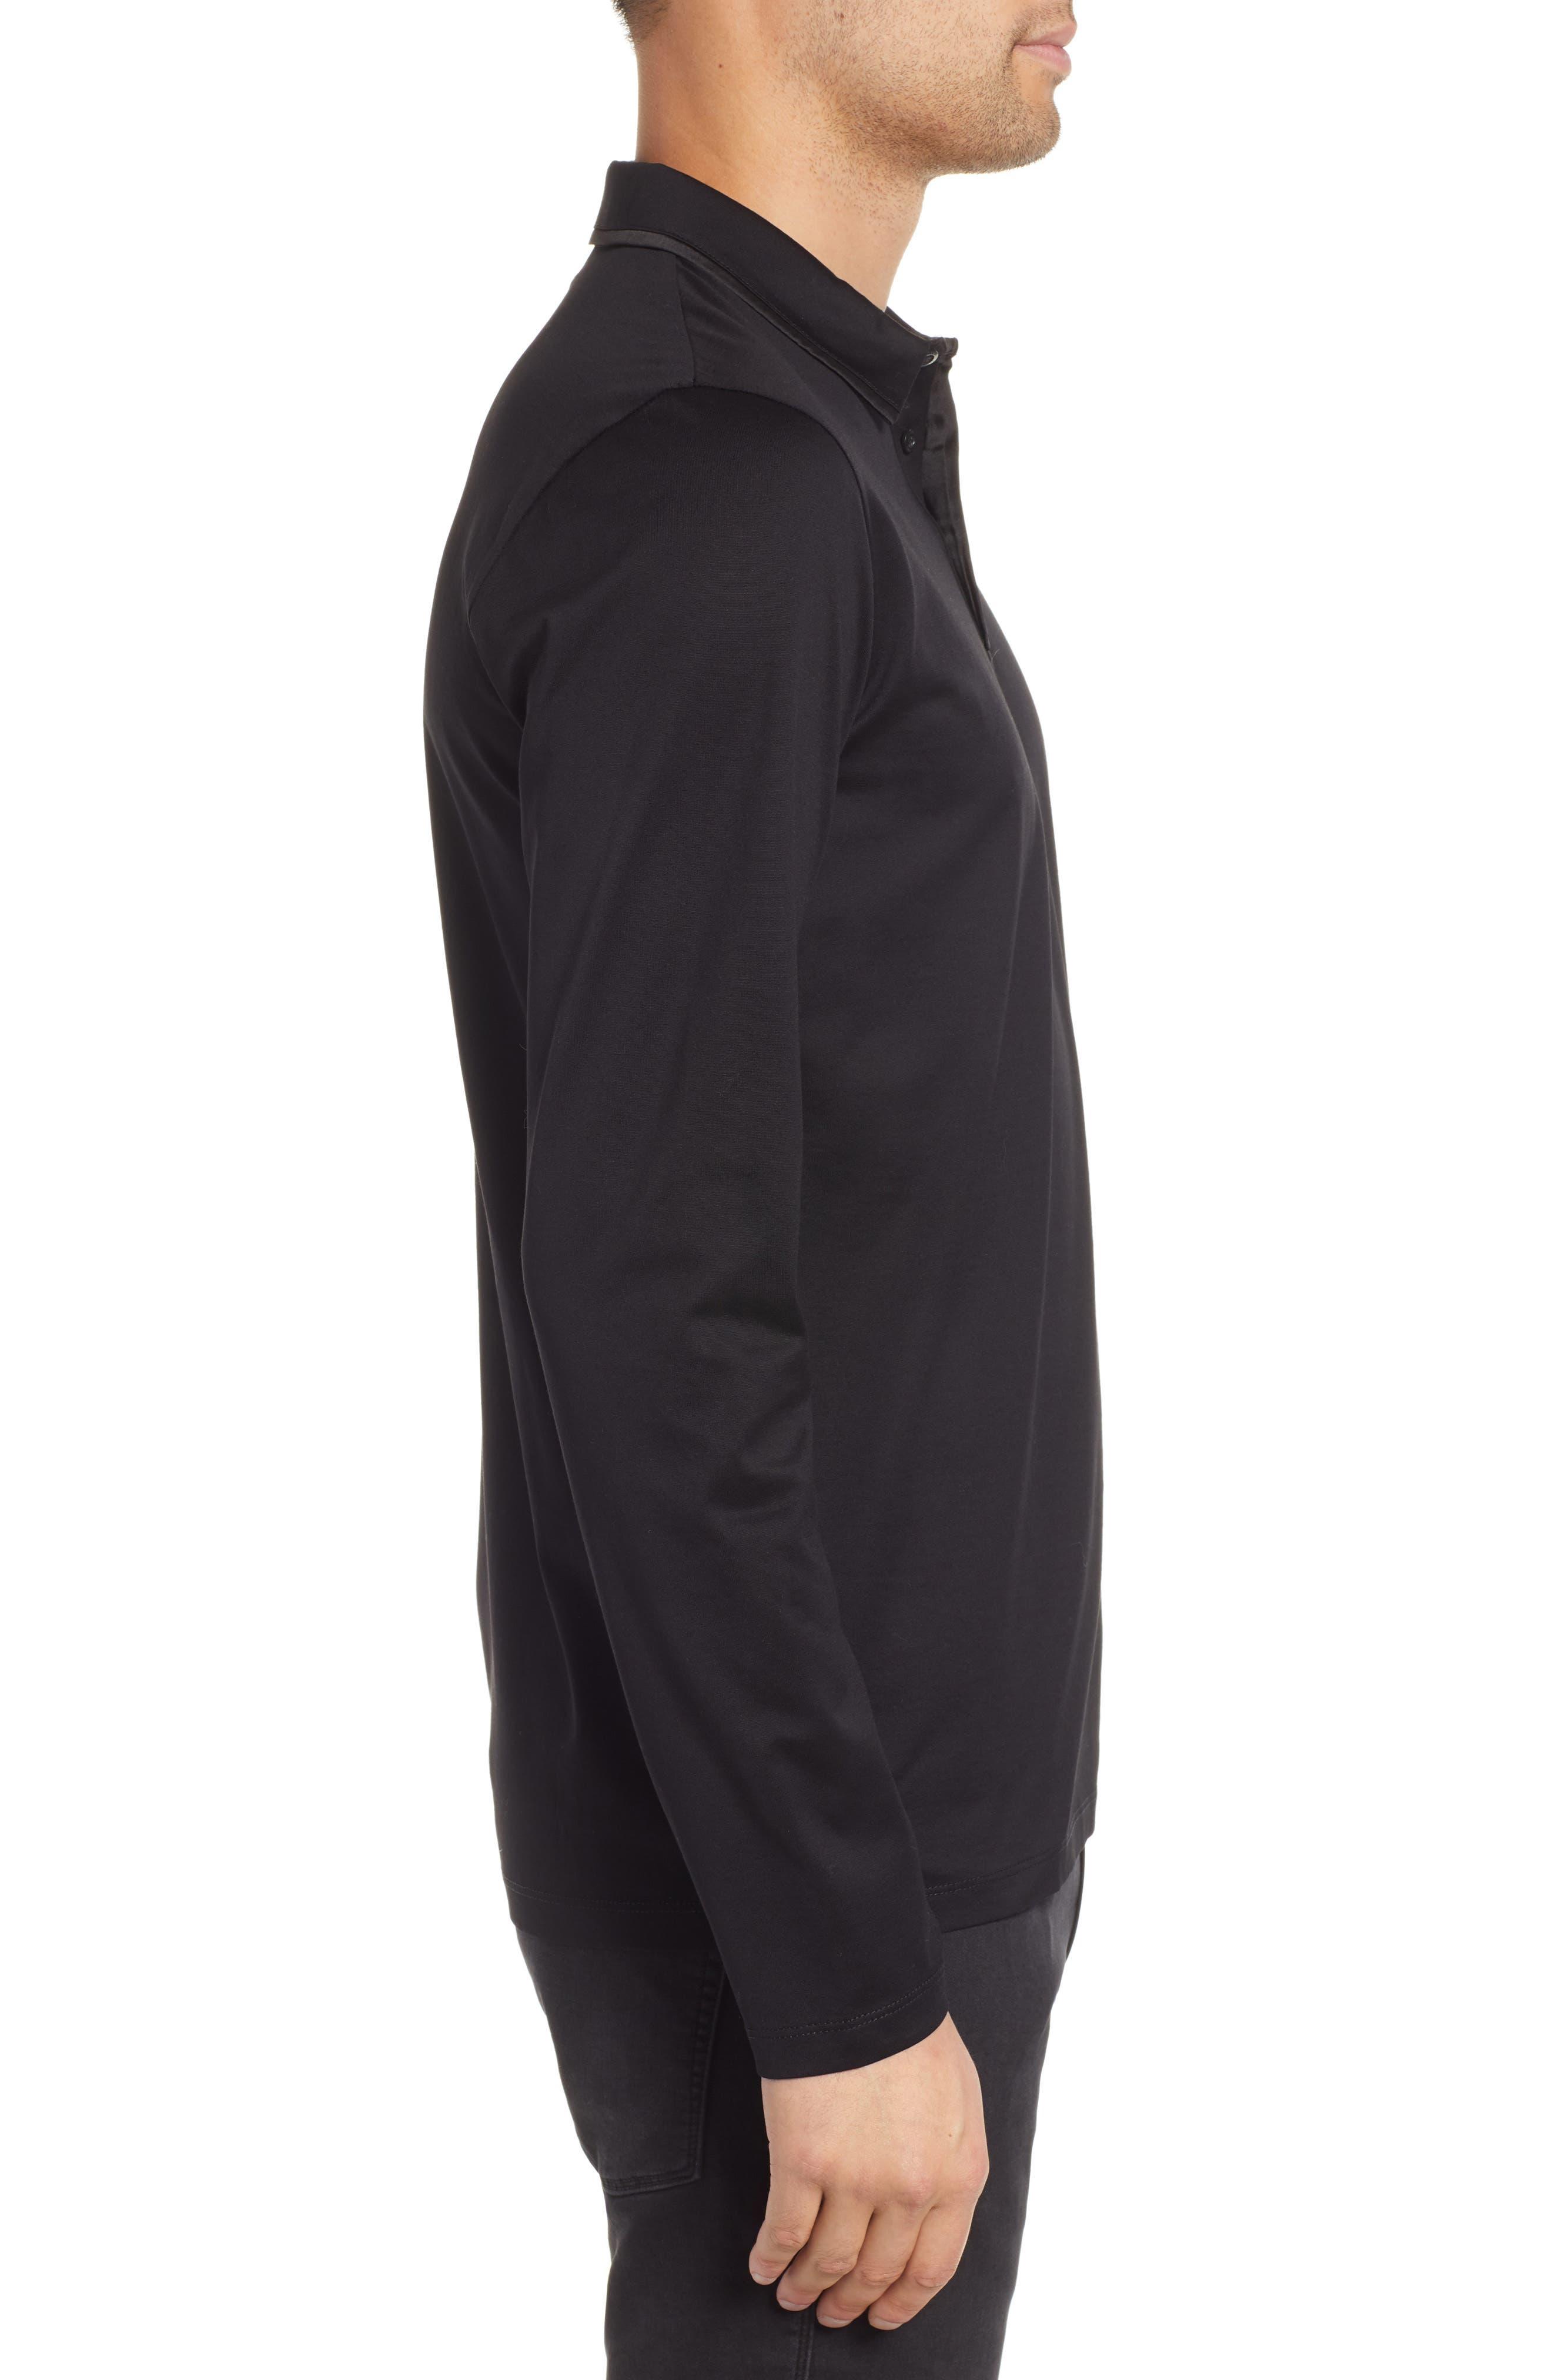 Dalendar Mercerized Cotton Slim Fit Polo Shirt,                             Alternate thumbnail 3, color,                             BLACK